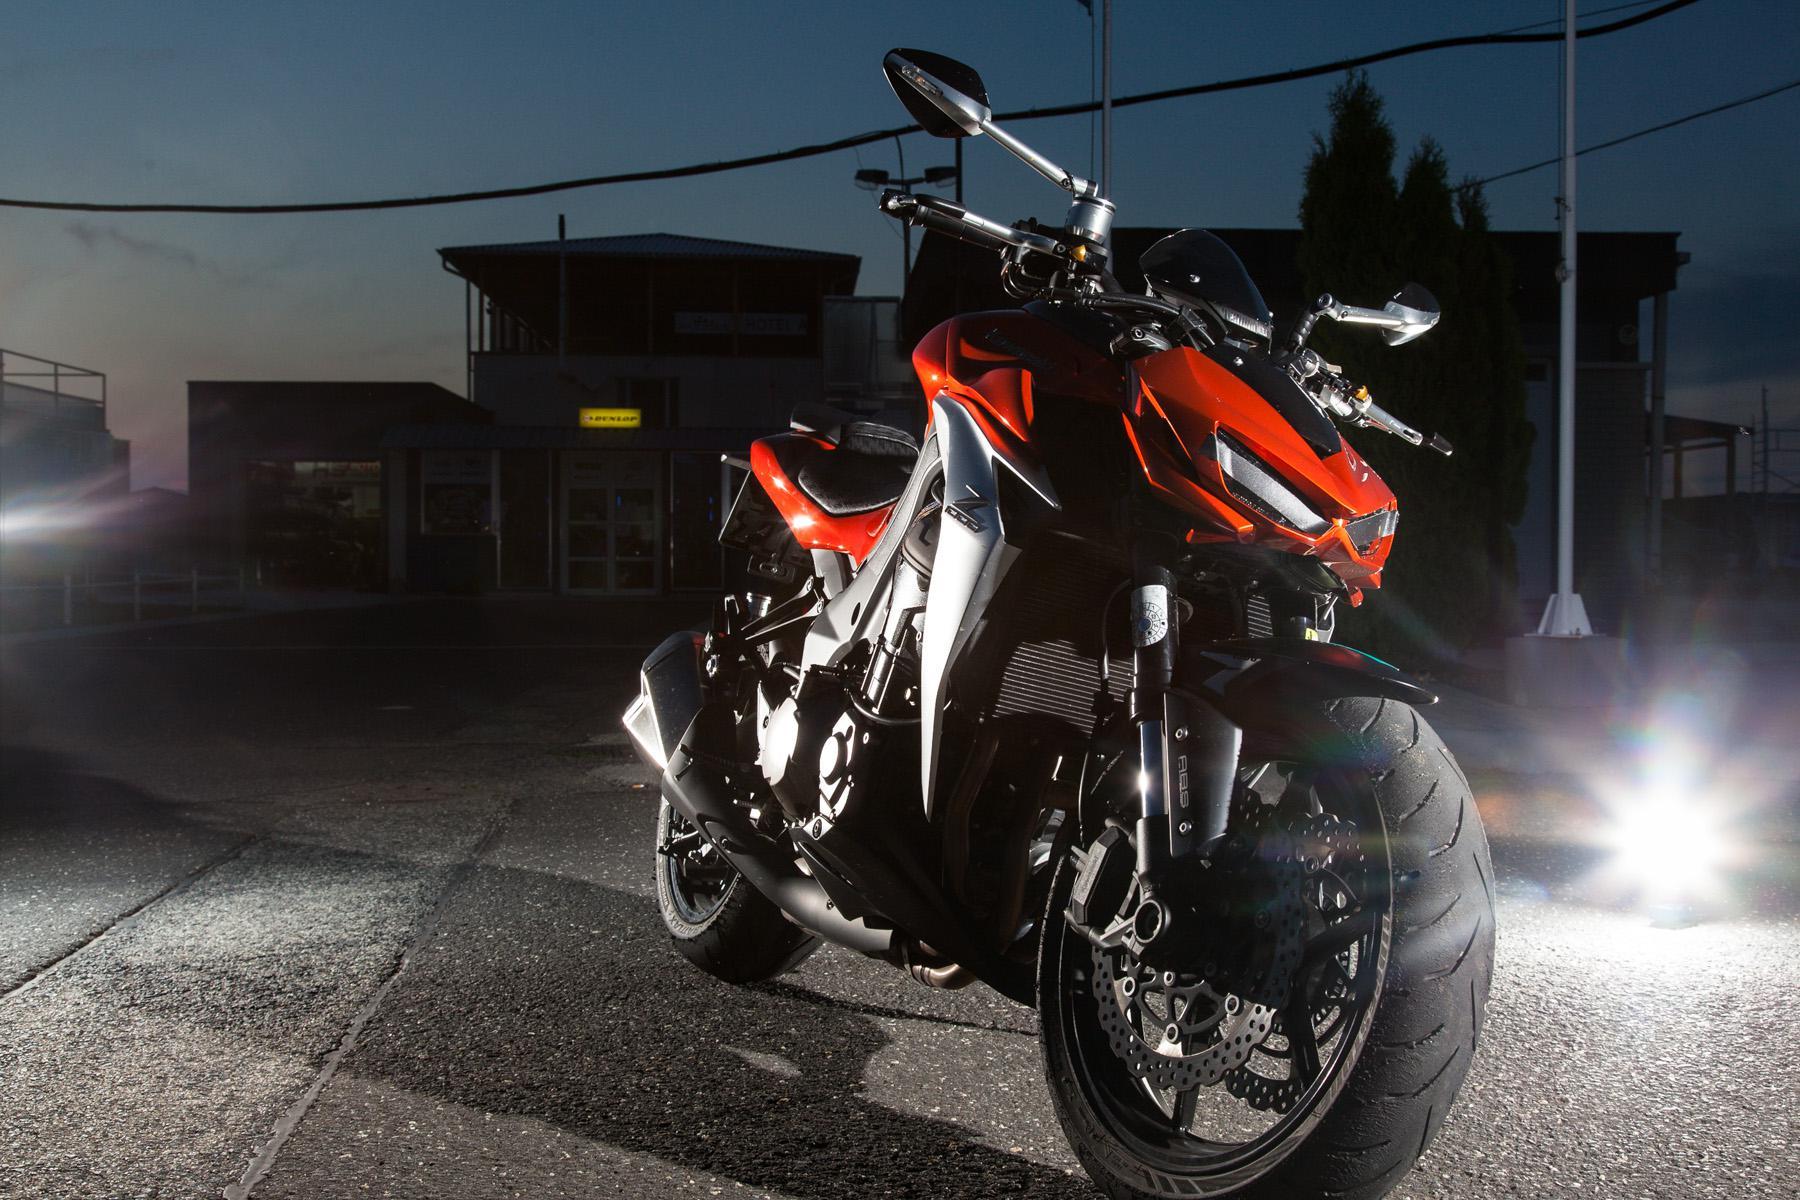 Kawasaki Z1000 Rizoma Testbericht Lighting System Circuit 2014 Dauertester Zubehr